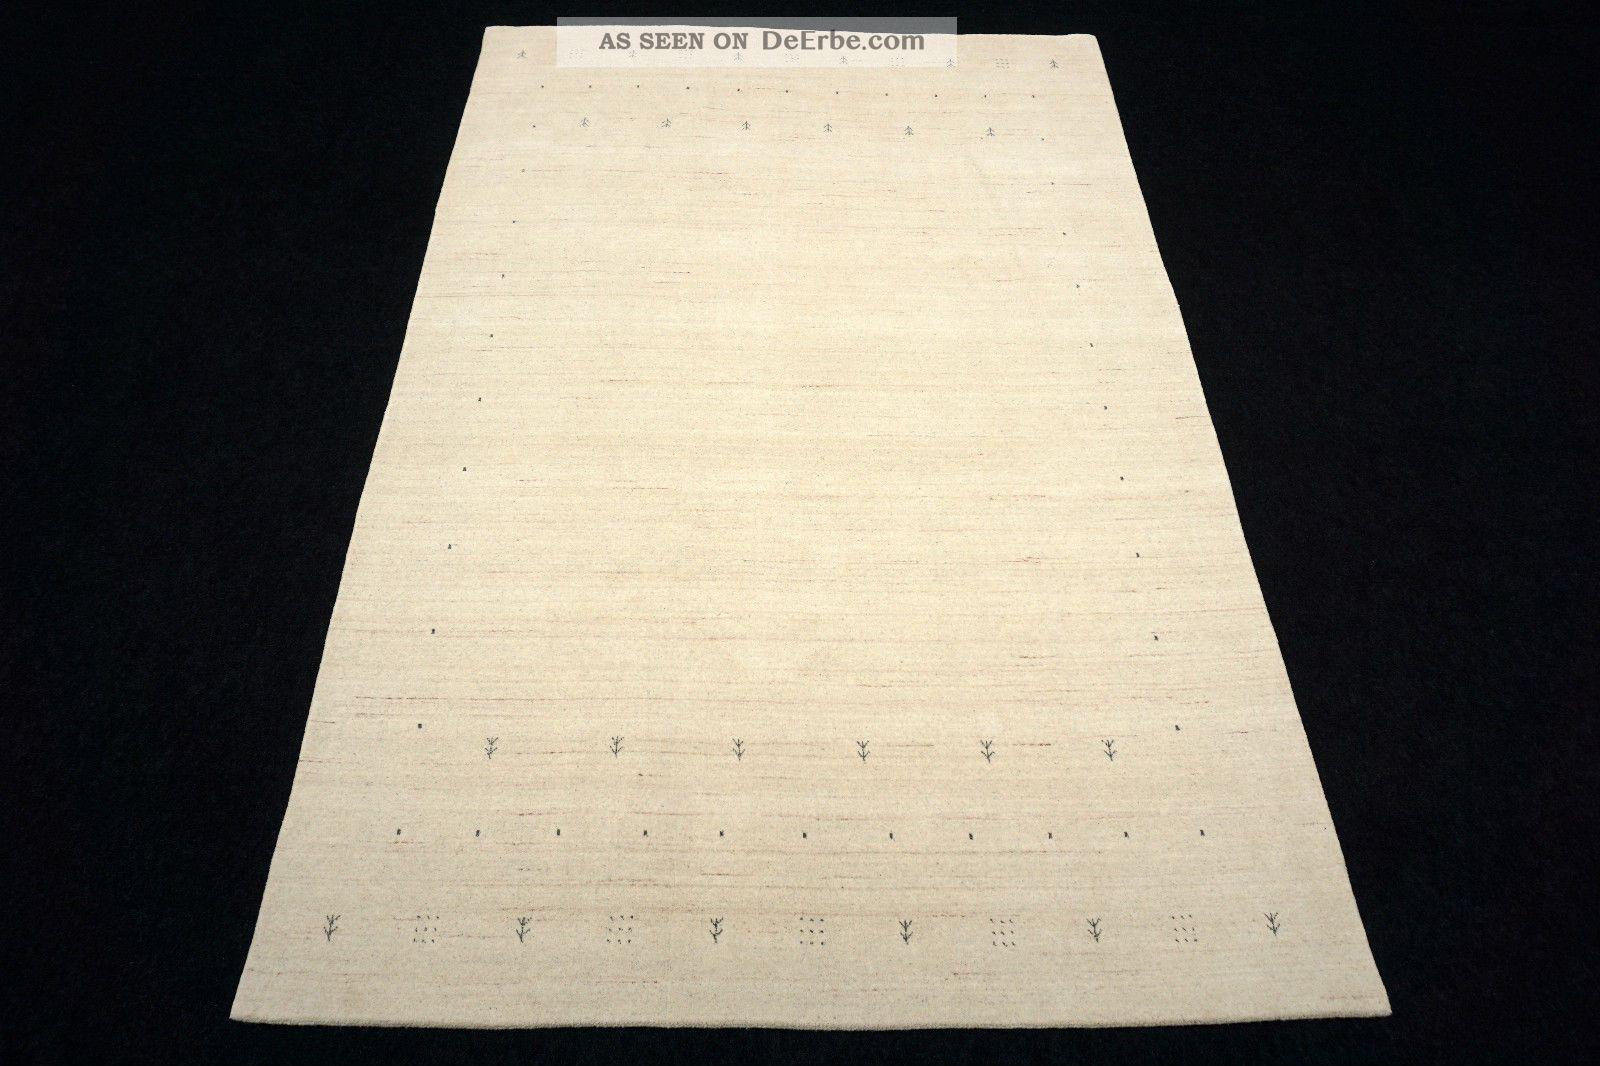 orient teppich indo gabbeh 300 x 200 cm beige carpet rug tappeto tapis alfombra. Black Bedroom Furniture Sets. Home Design Ideas